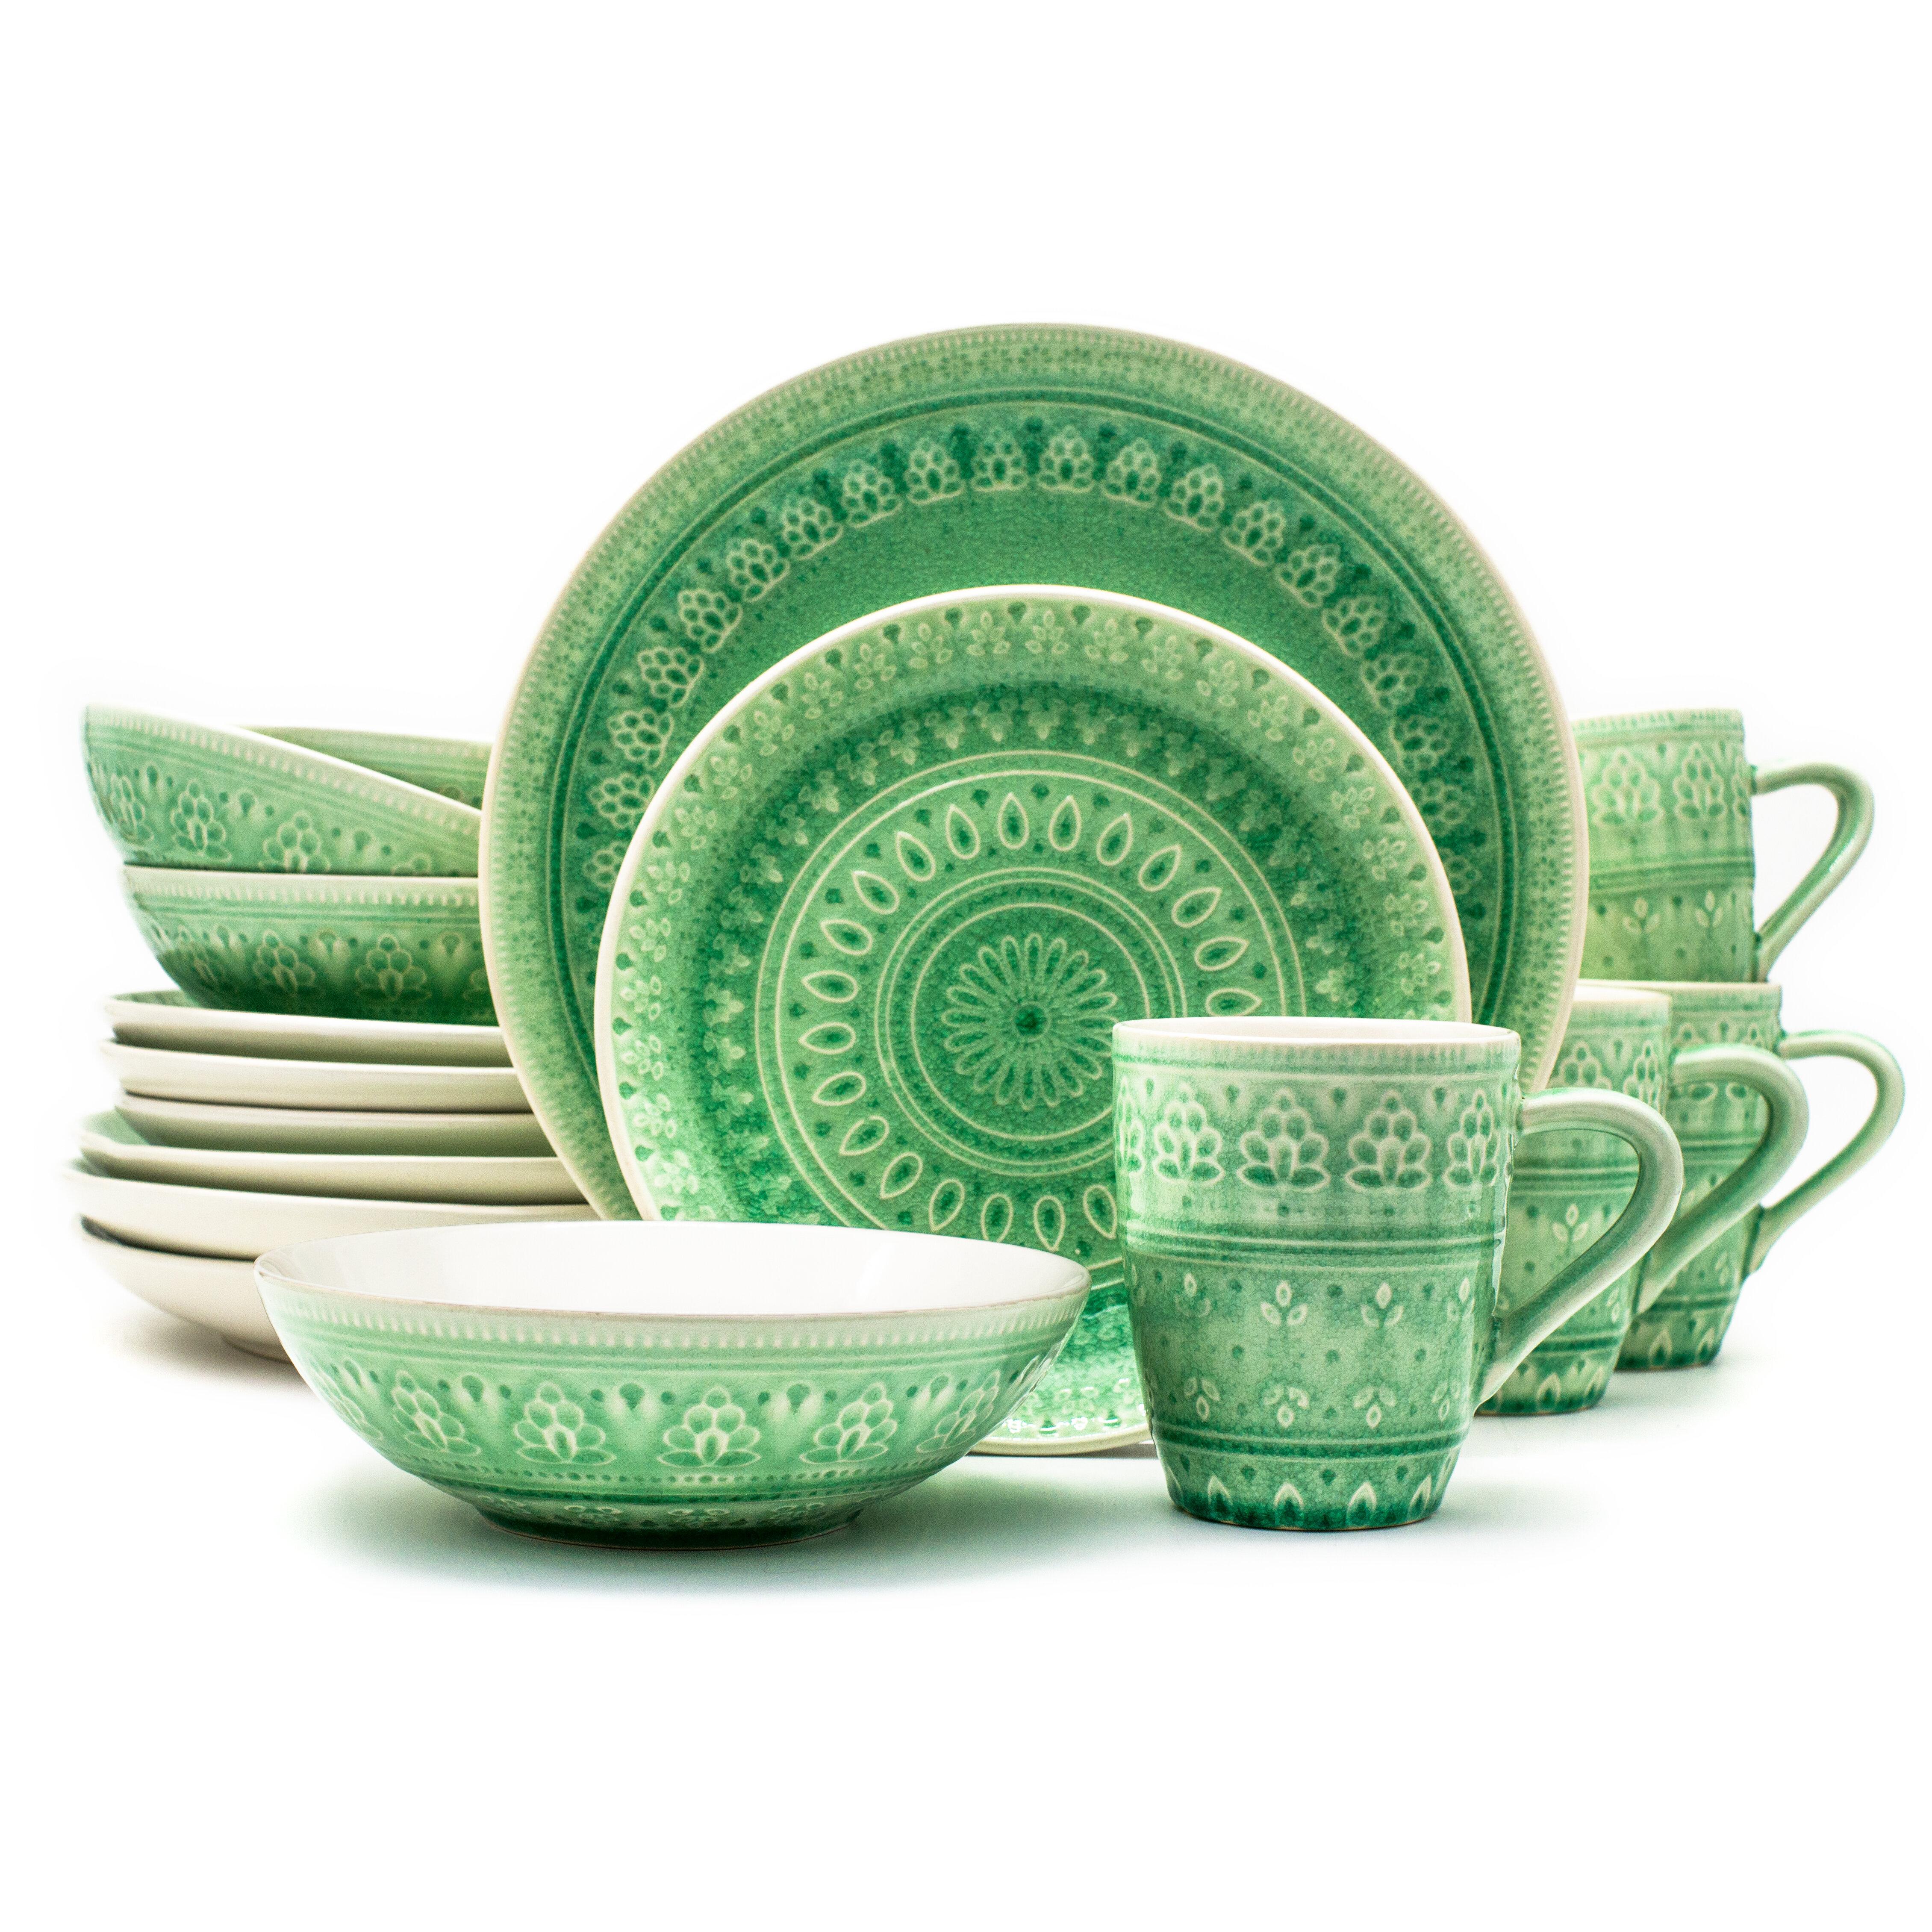 Mistana Halsey 16 Piece Dinnerware Set, Service For 4 U0026 Reviews | Wayfair